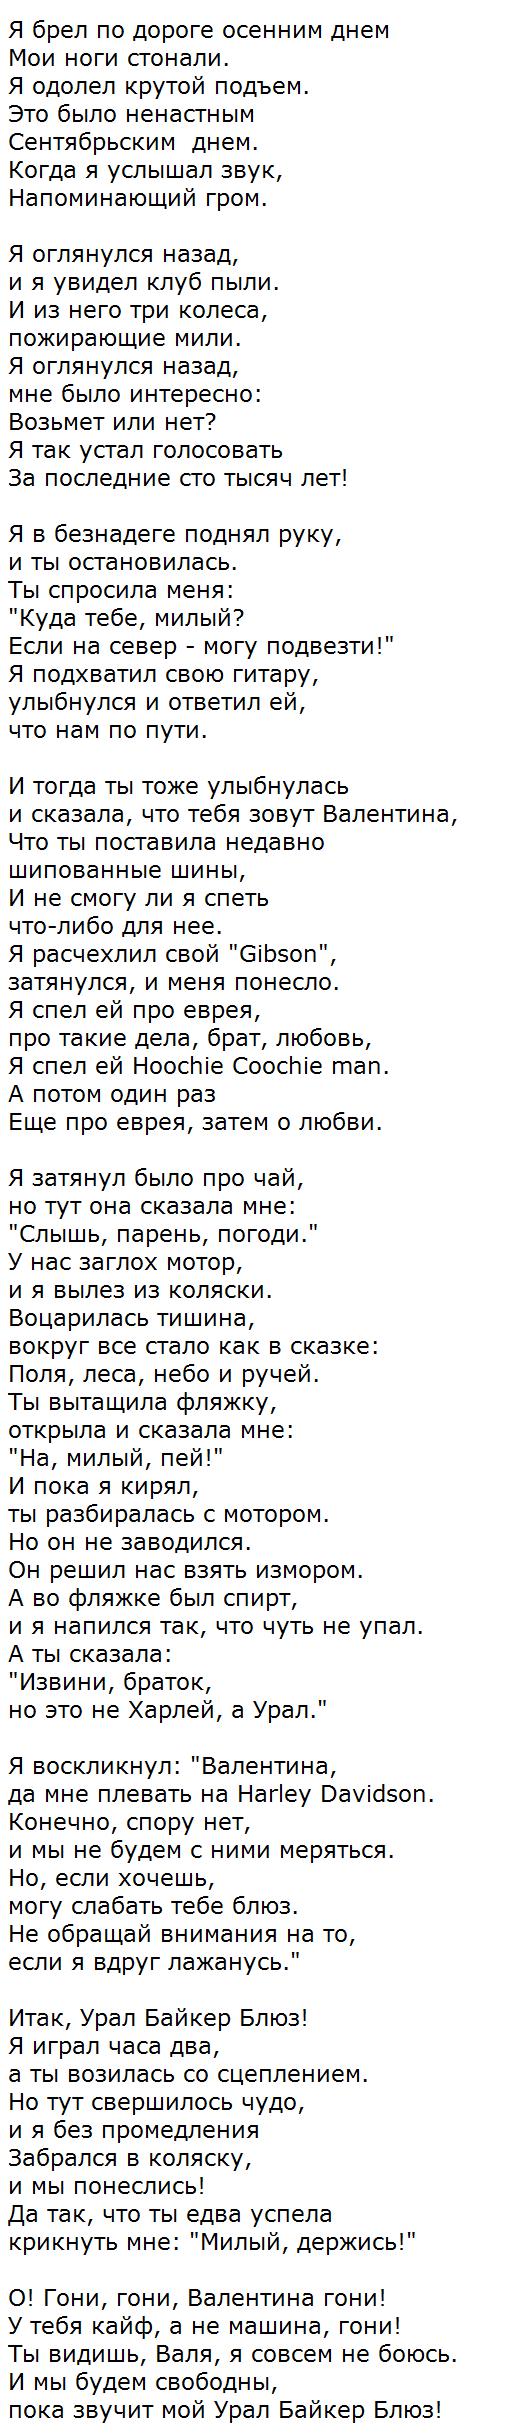 Чиж - Уралбайкерблюз